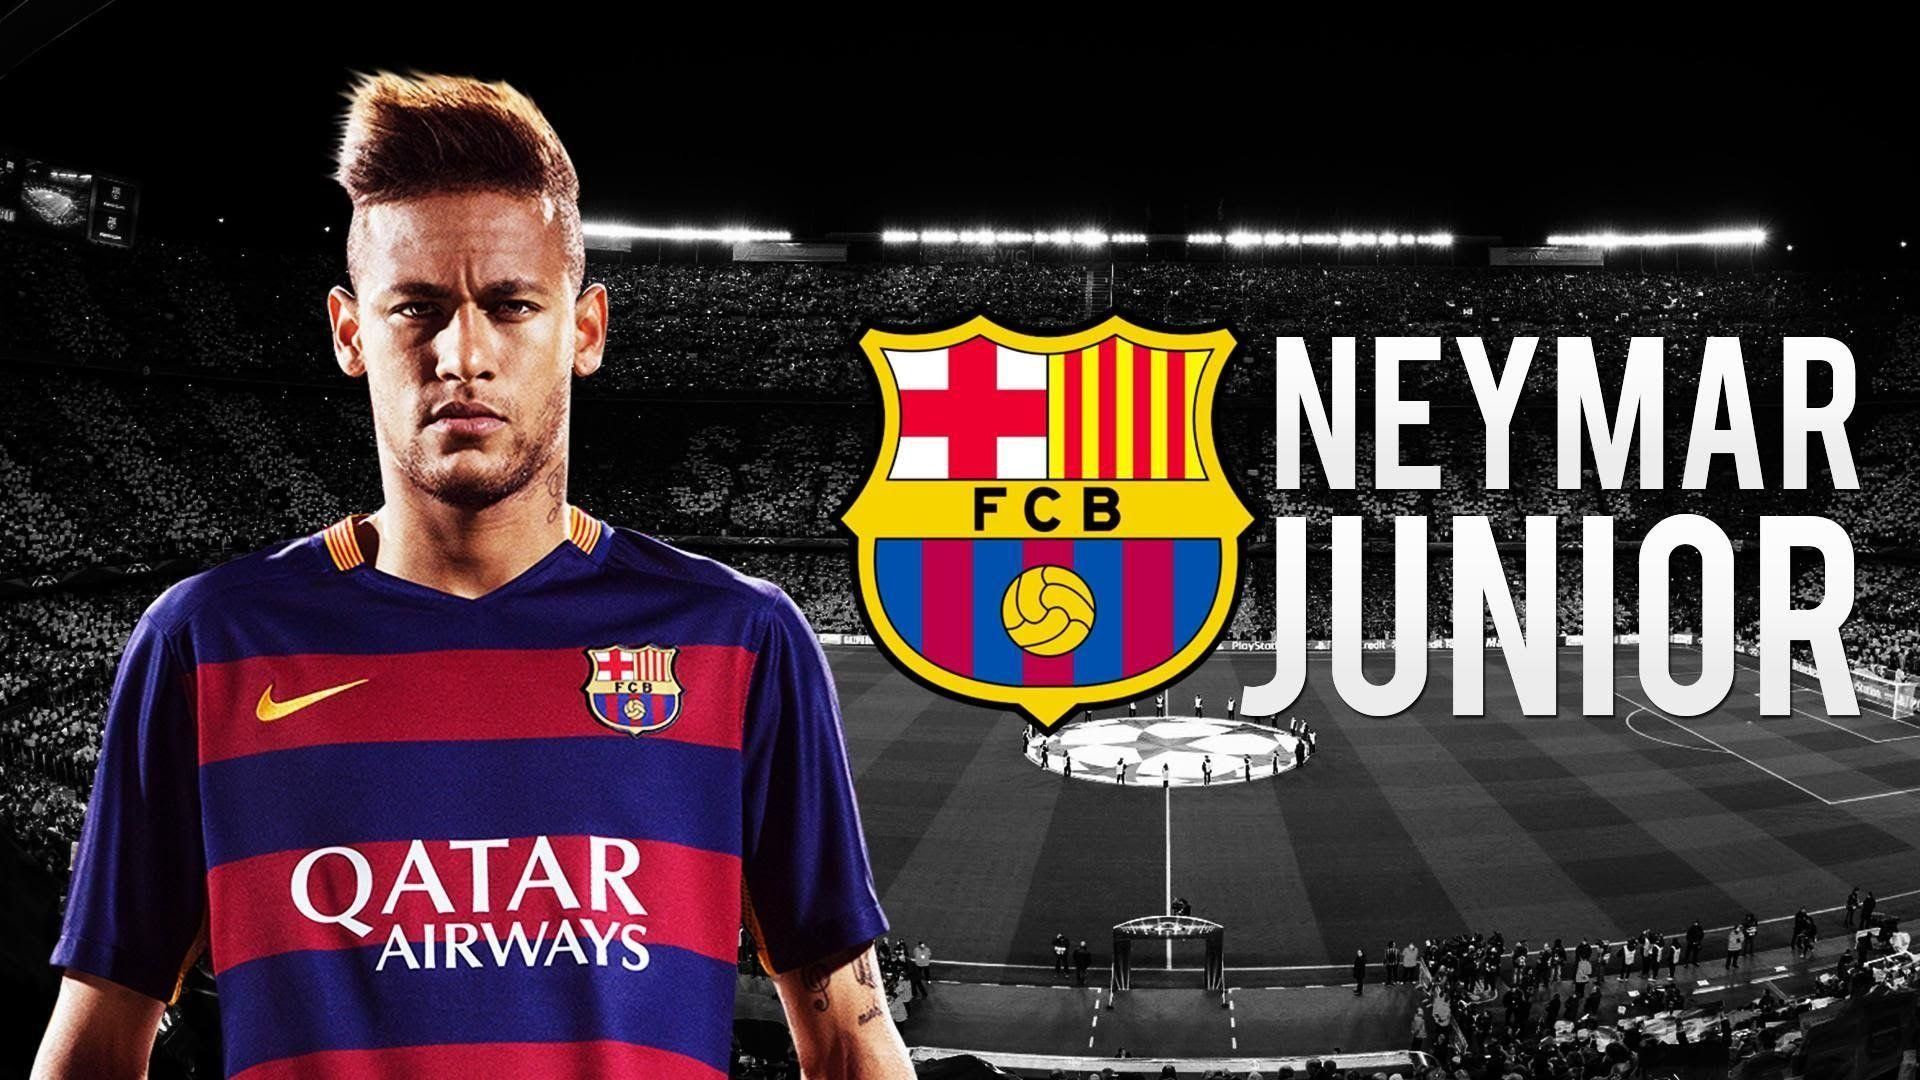 Neymar Jr Wallpaper 2018 78 Images